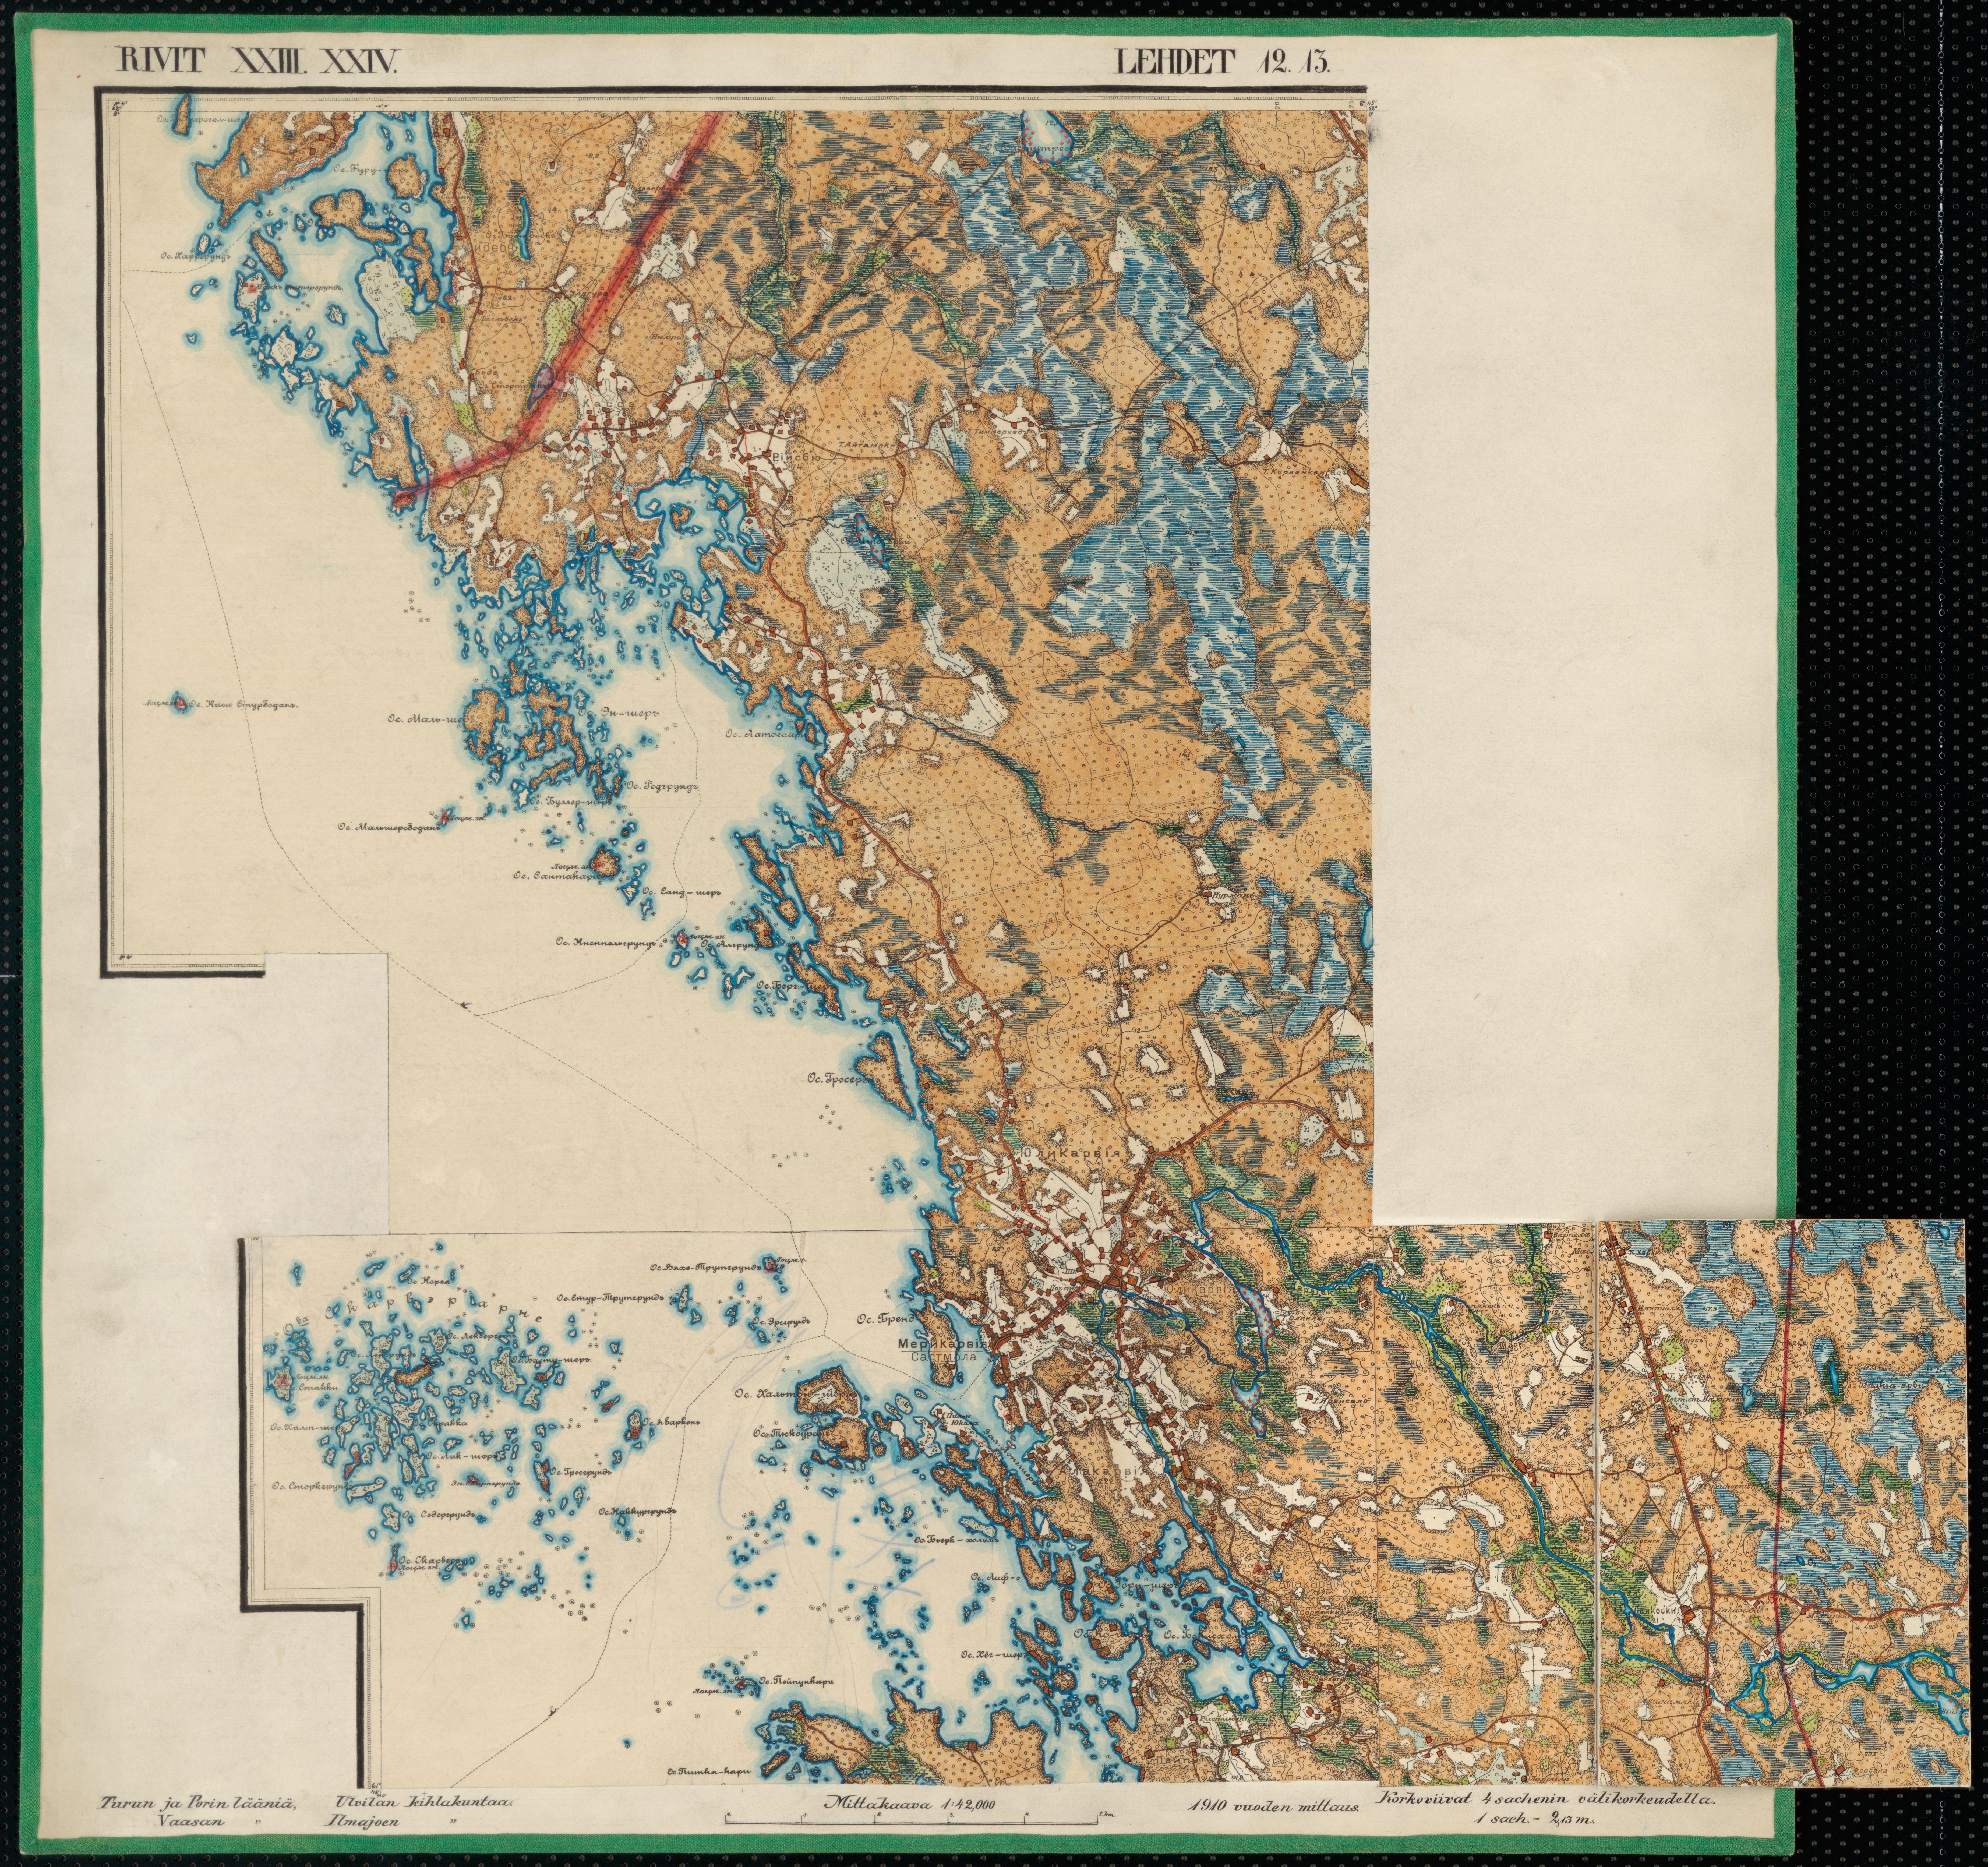 File Senate Atlas 1870 1907 Sheet Xxiii Xxiv 12 13 Merikarvia